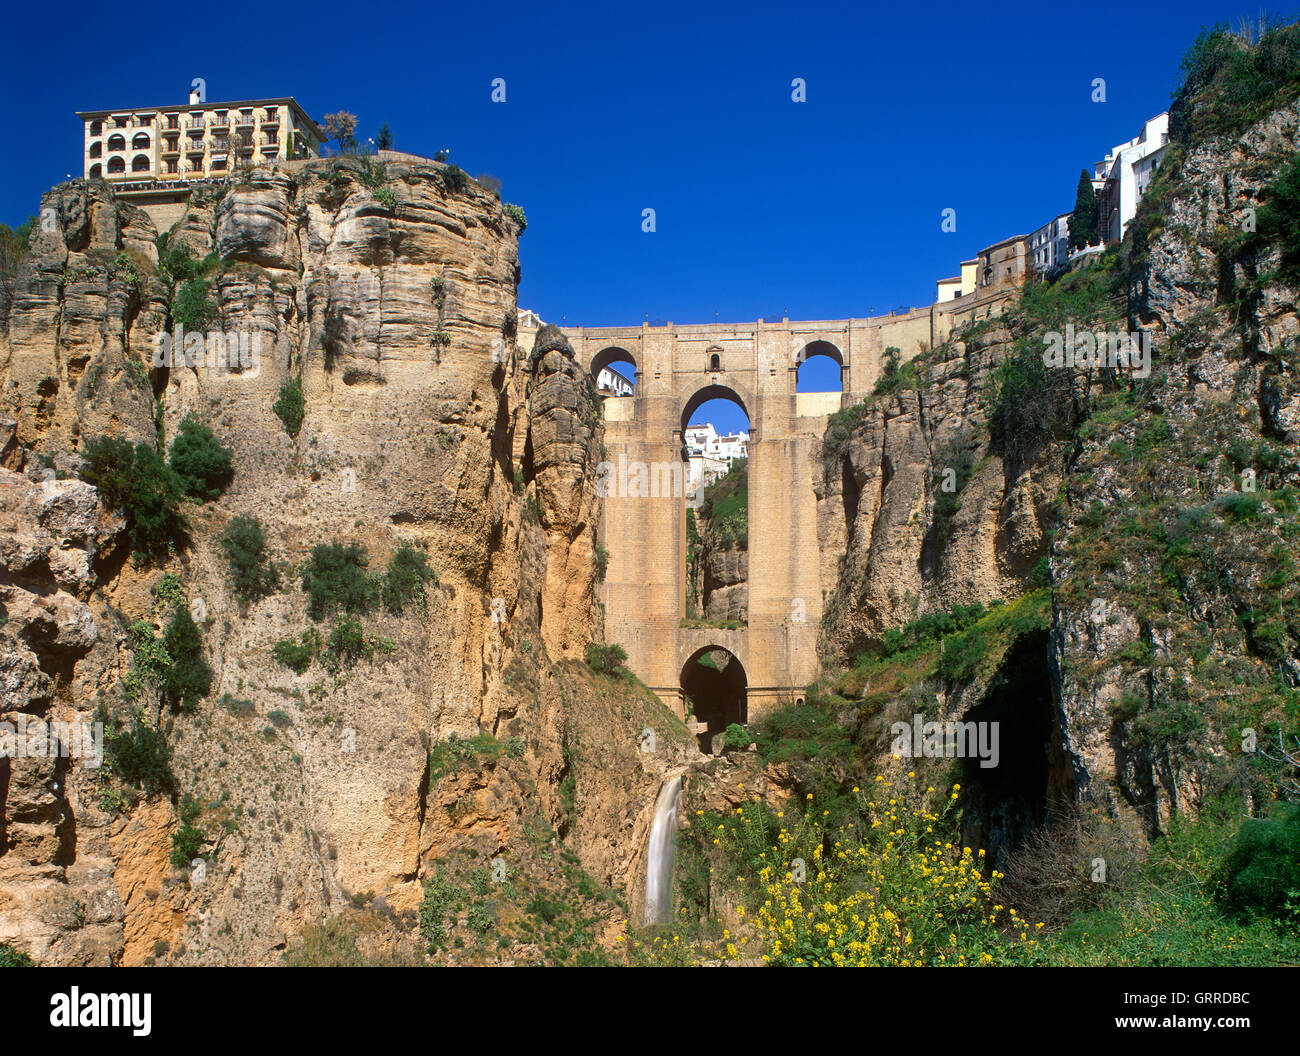 Puente Nuevo and El Tajo Gorge, Ronda, Andalucia, Spain - Stock Image